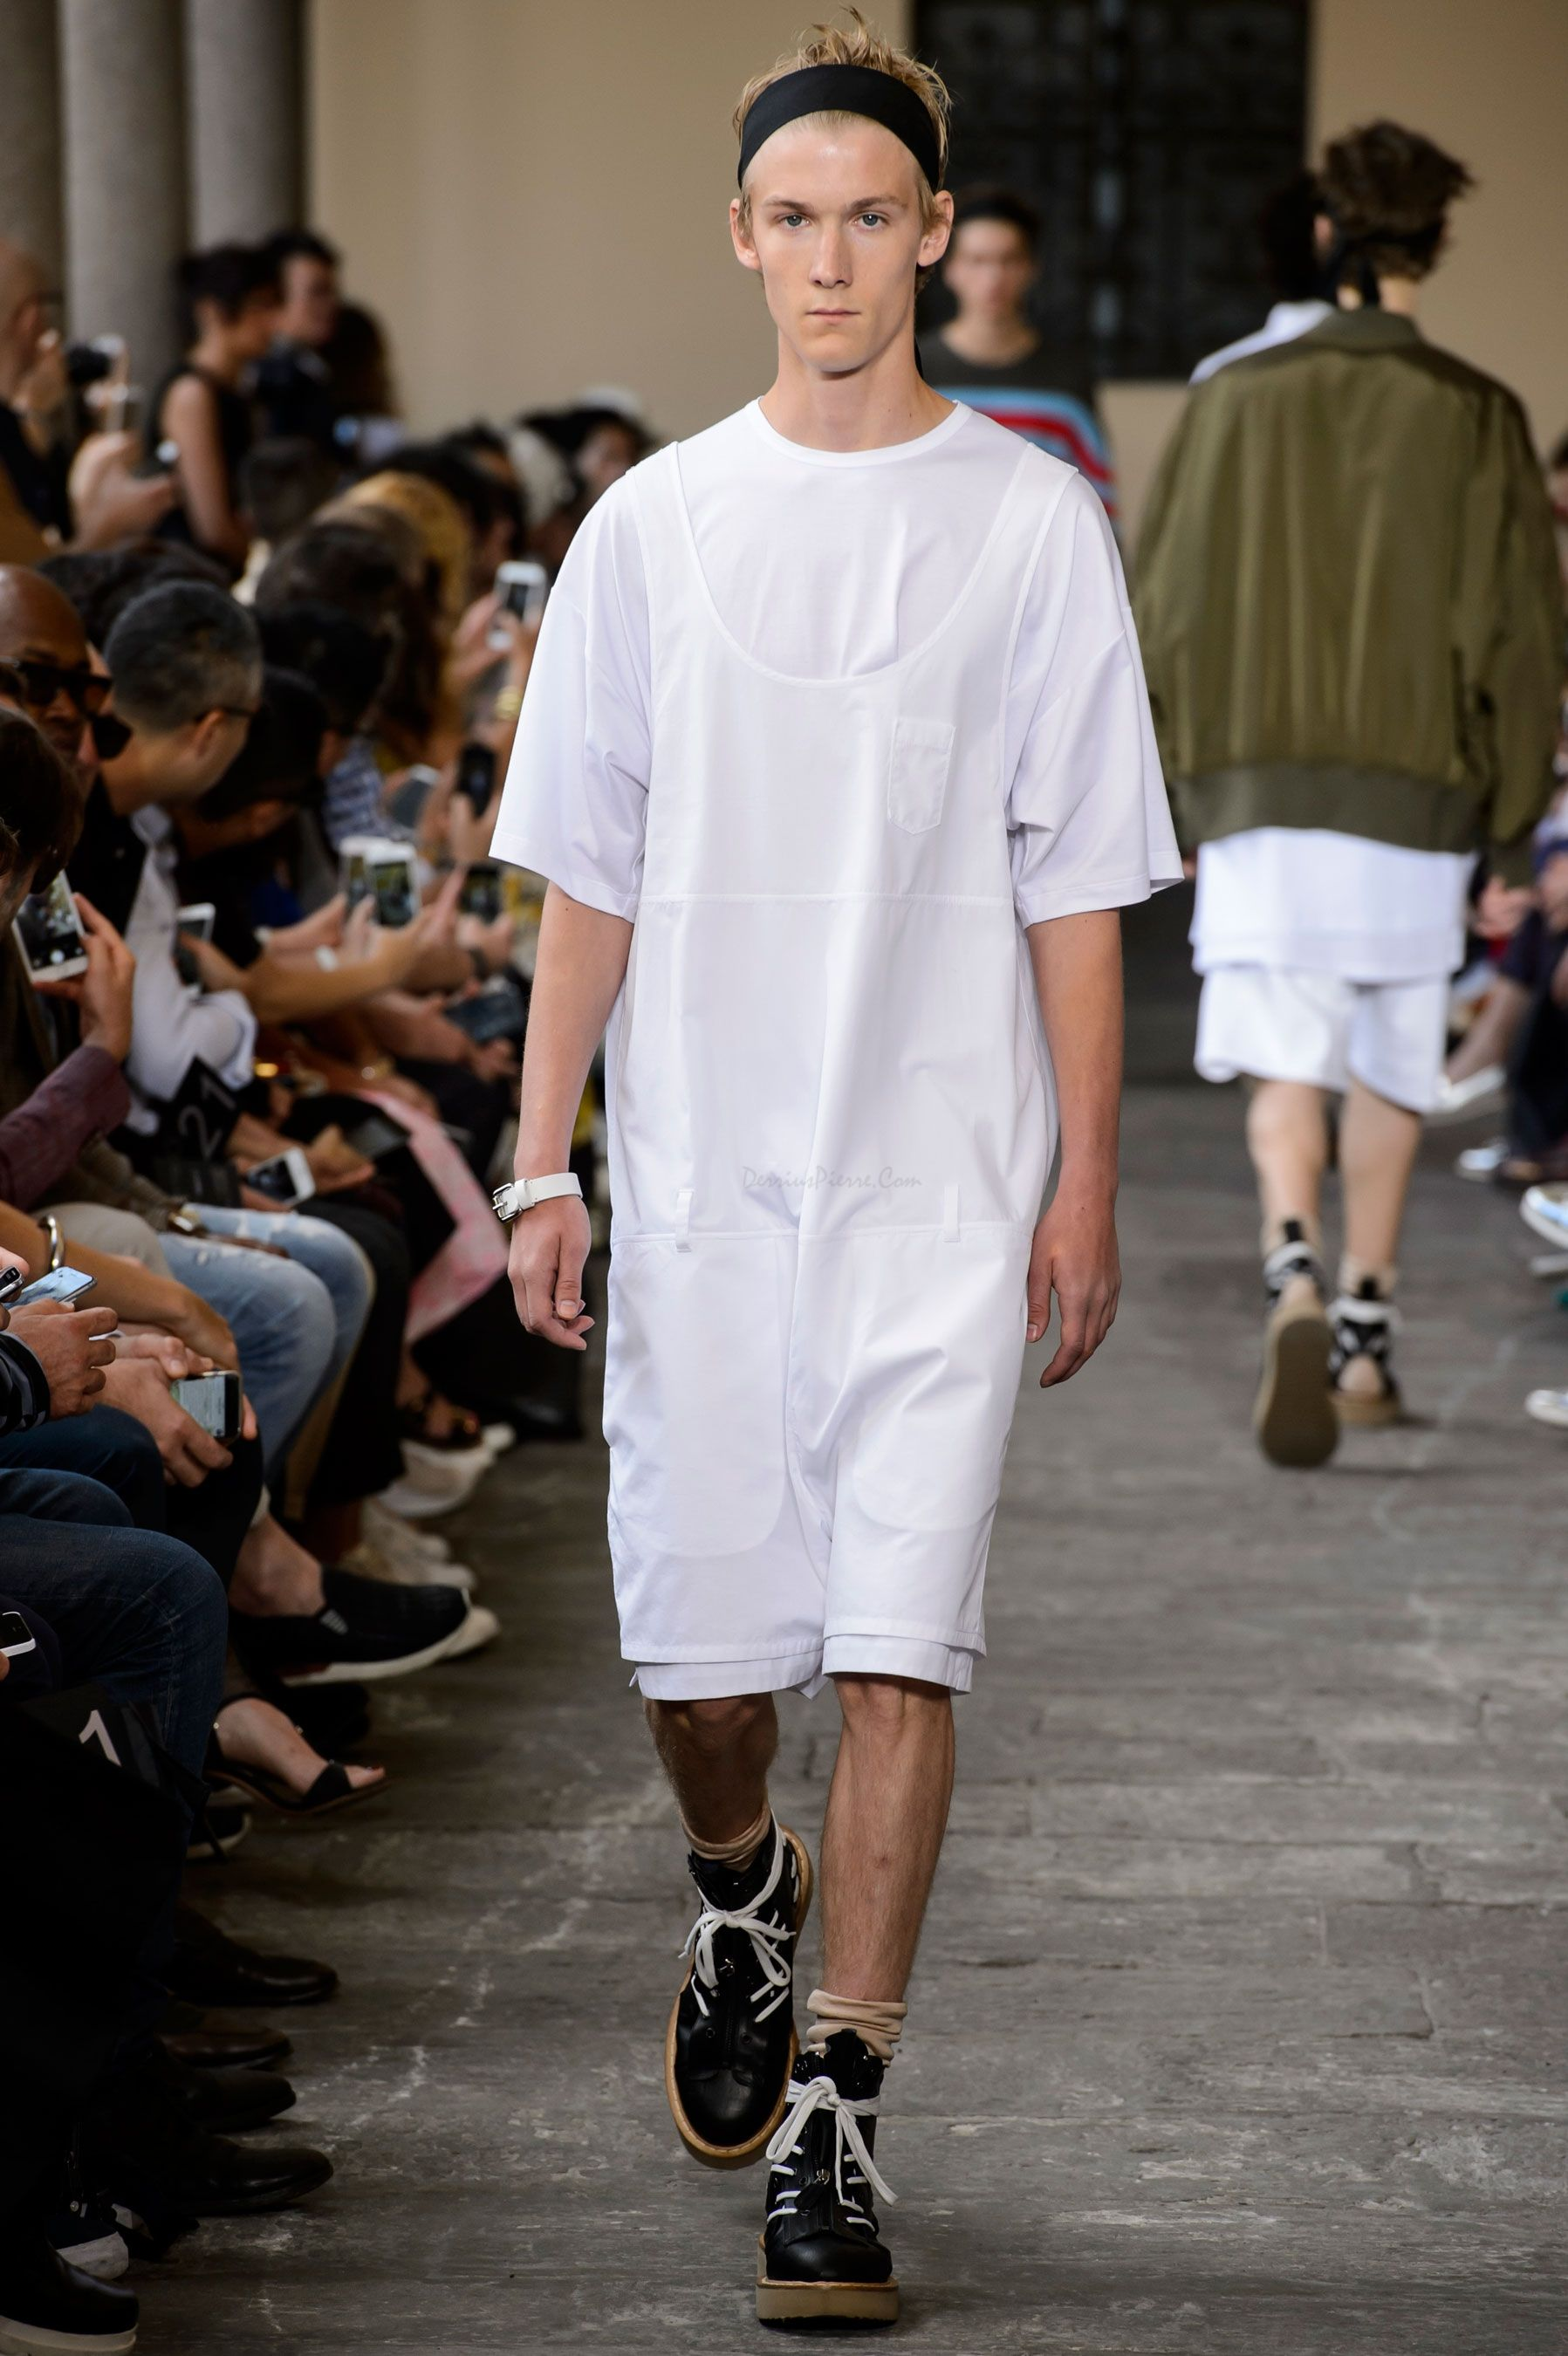 N.21 Spring Summer 2016 Primavera Verano Collection #Menswear #Trends #Tendencias #Moda Hombre- Milan Fashion Week - D.P.